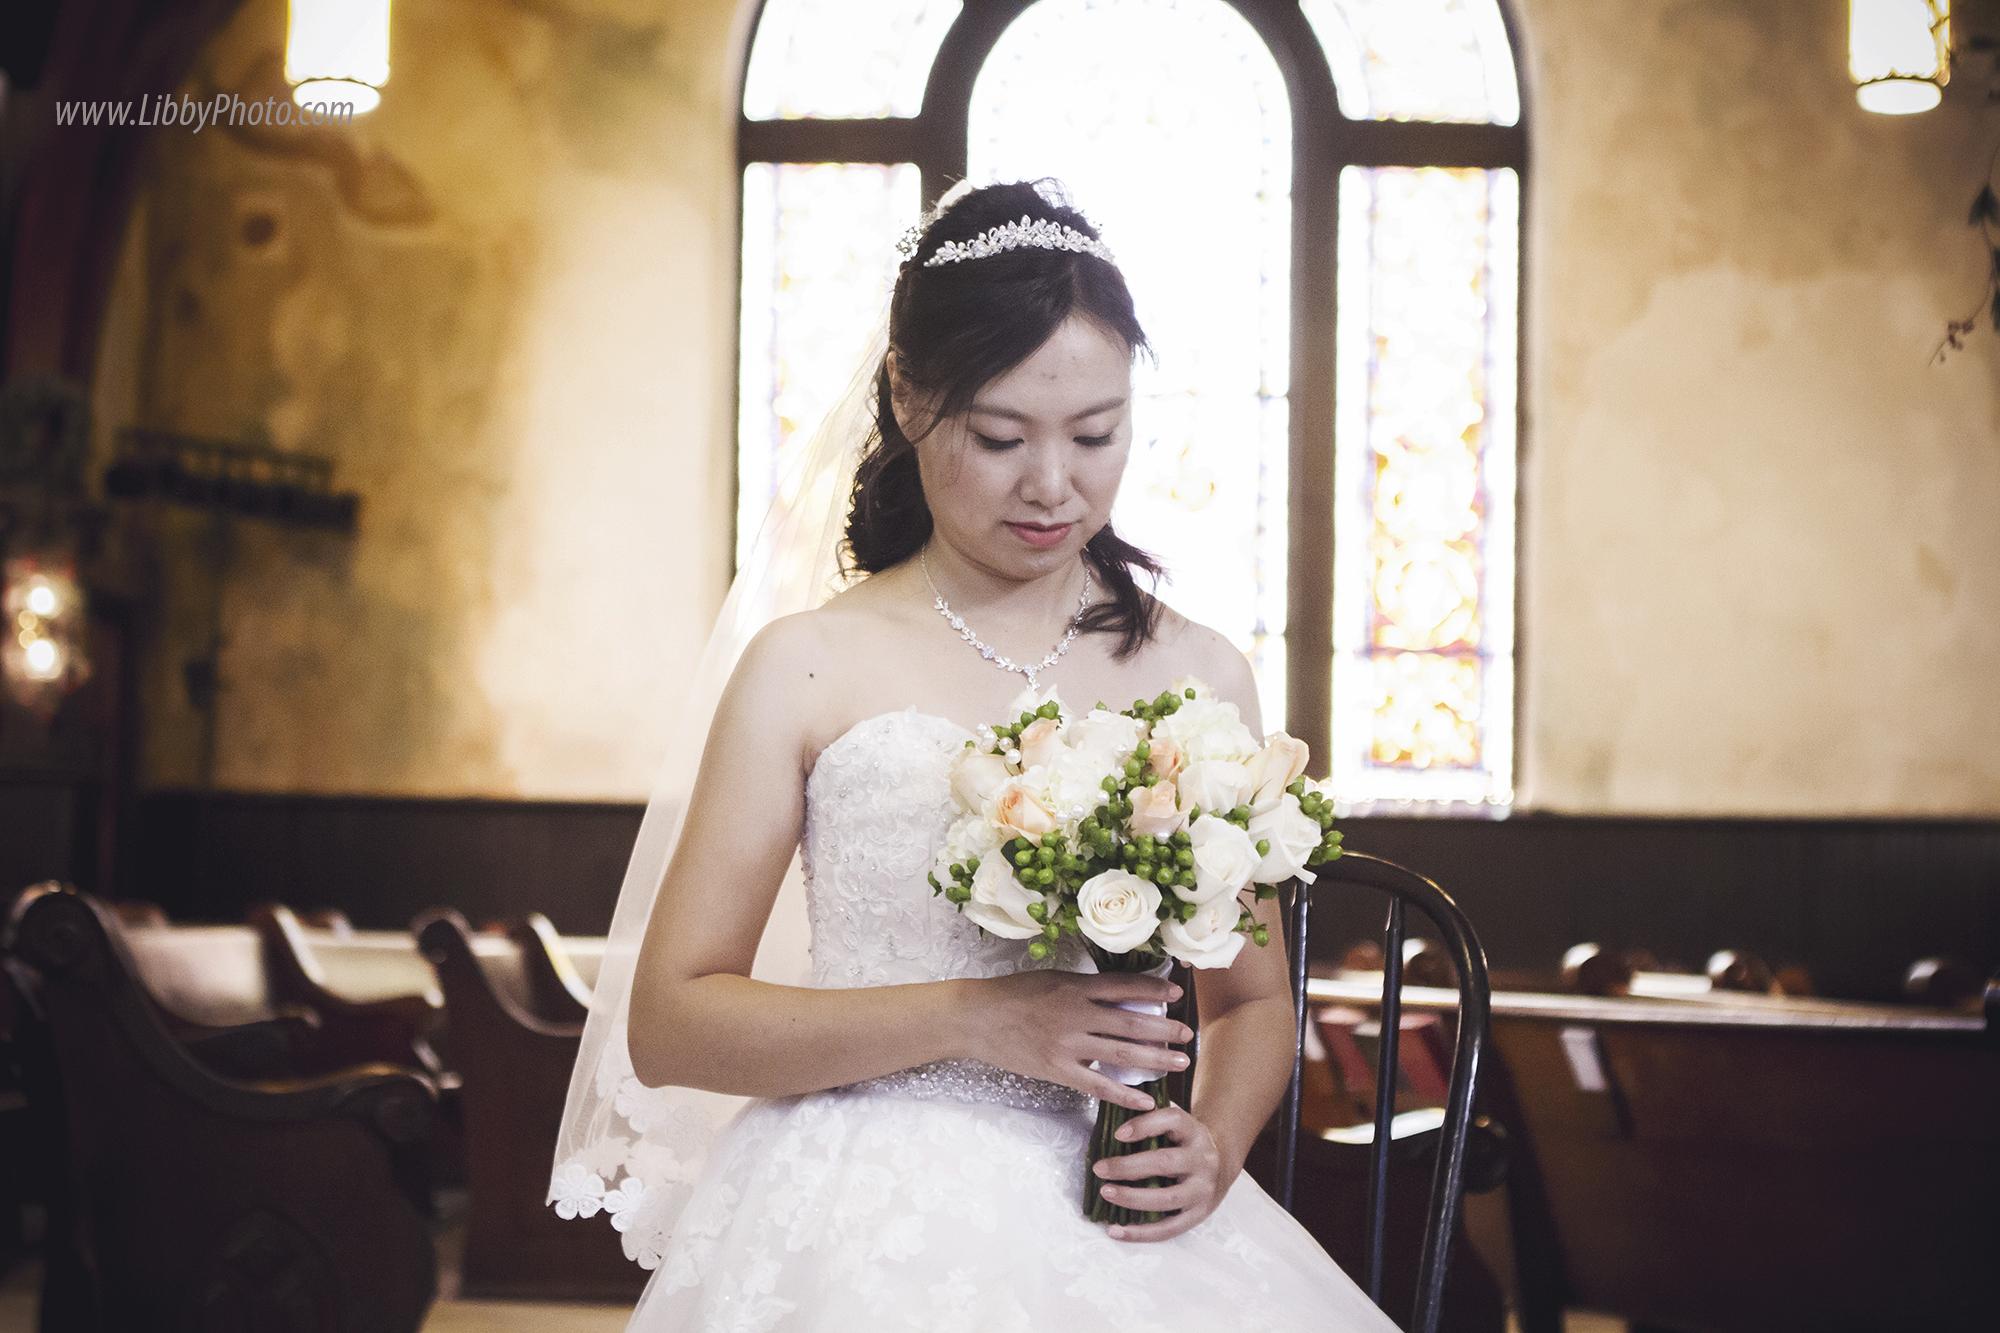 Atlanta wedding photography Libbyphoto (6).jpg